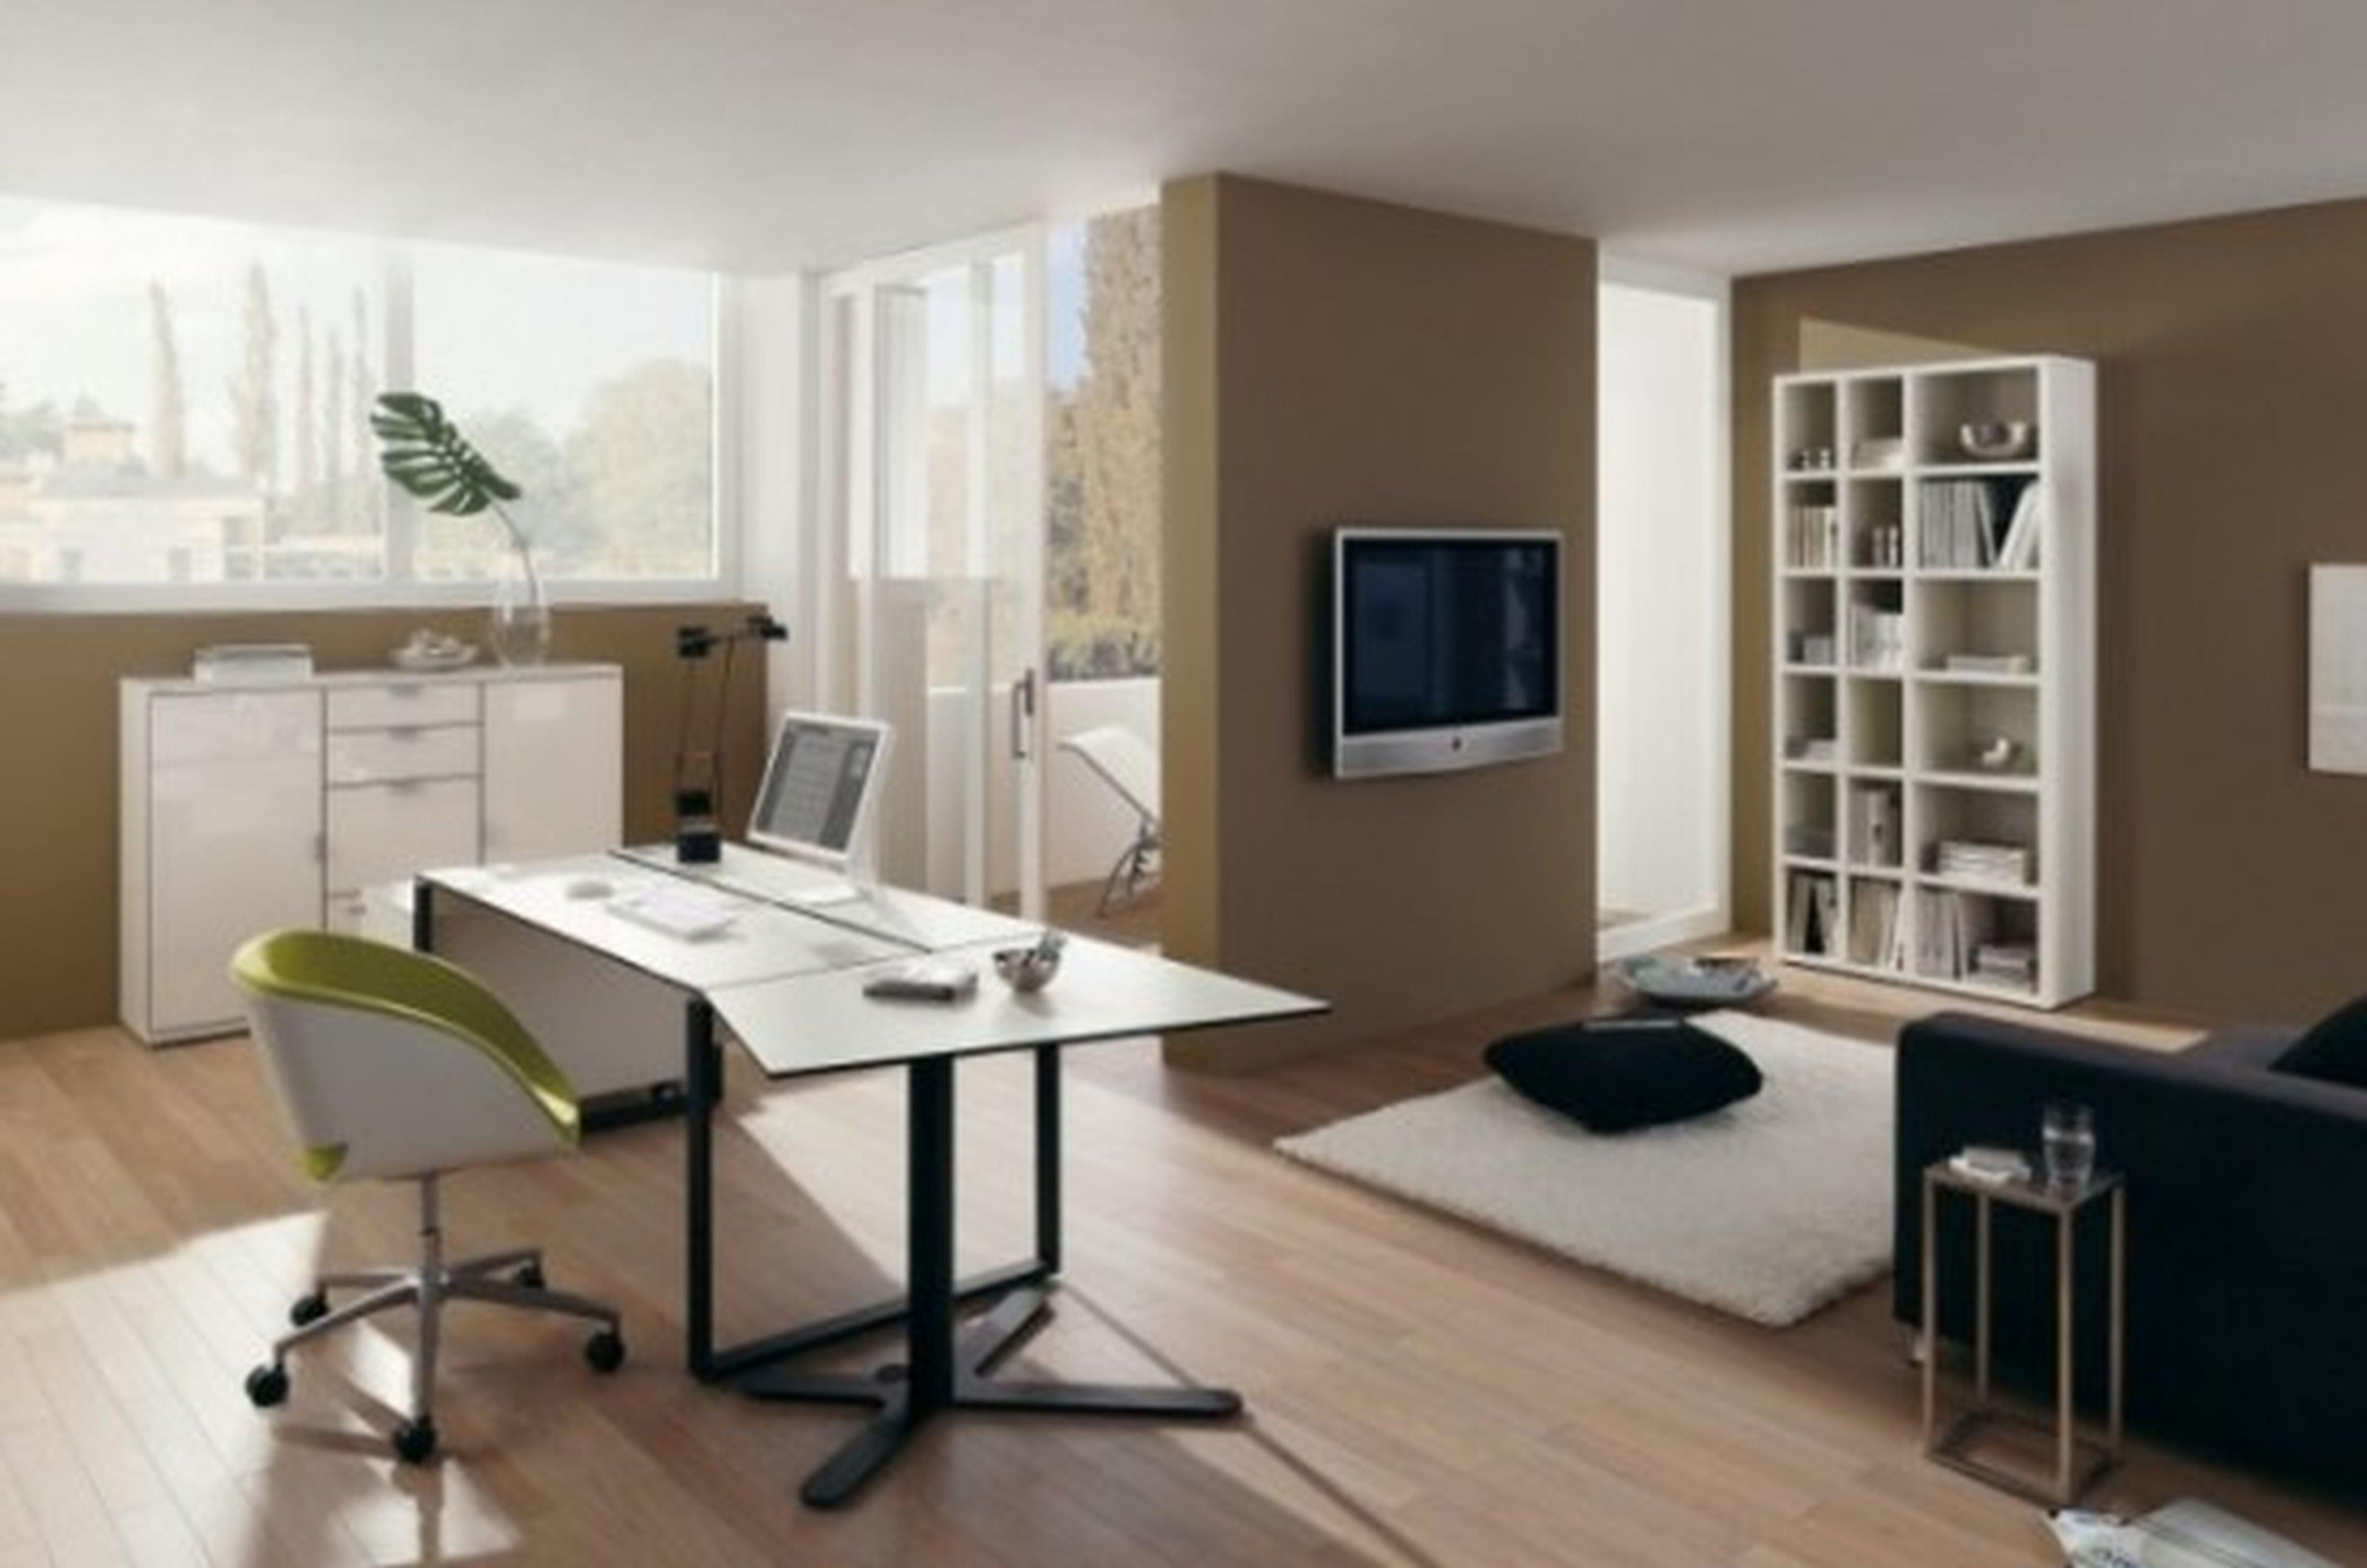 10 Nice Home Office Paint Color Ideas uncategorized home office painting ideas within trendy paint color 2020